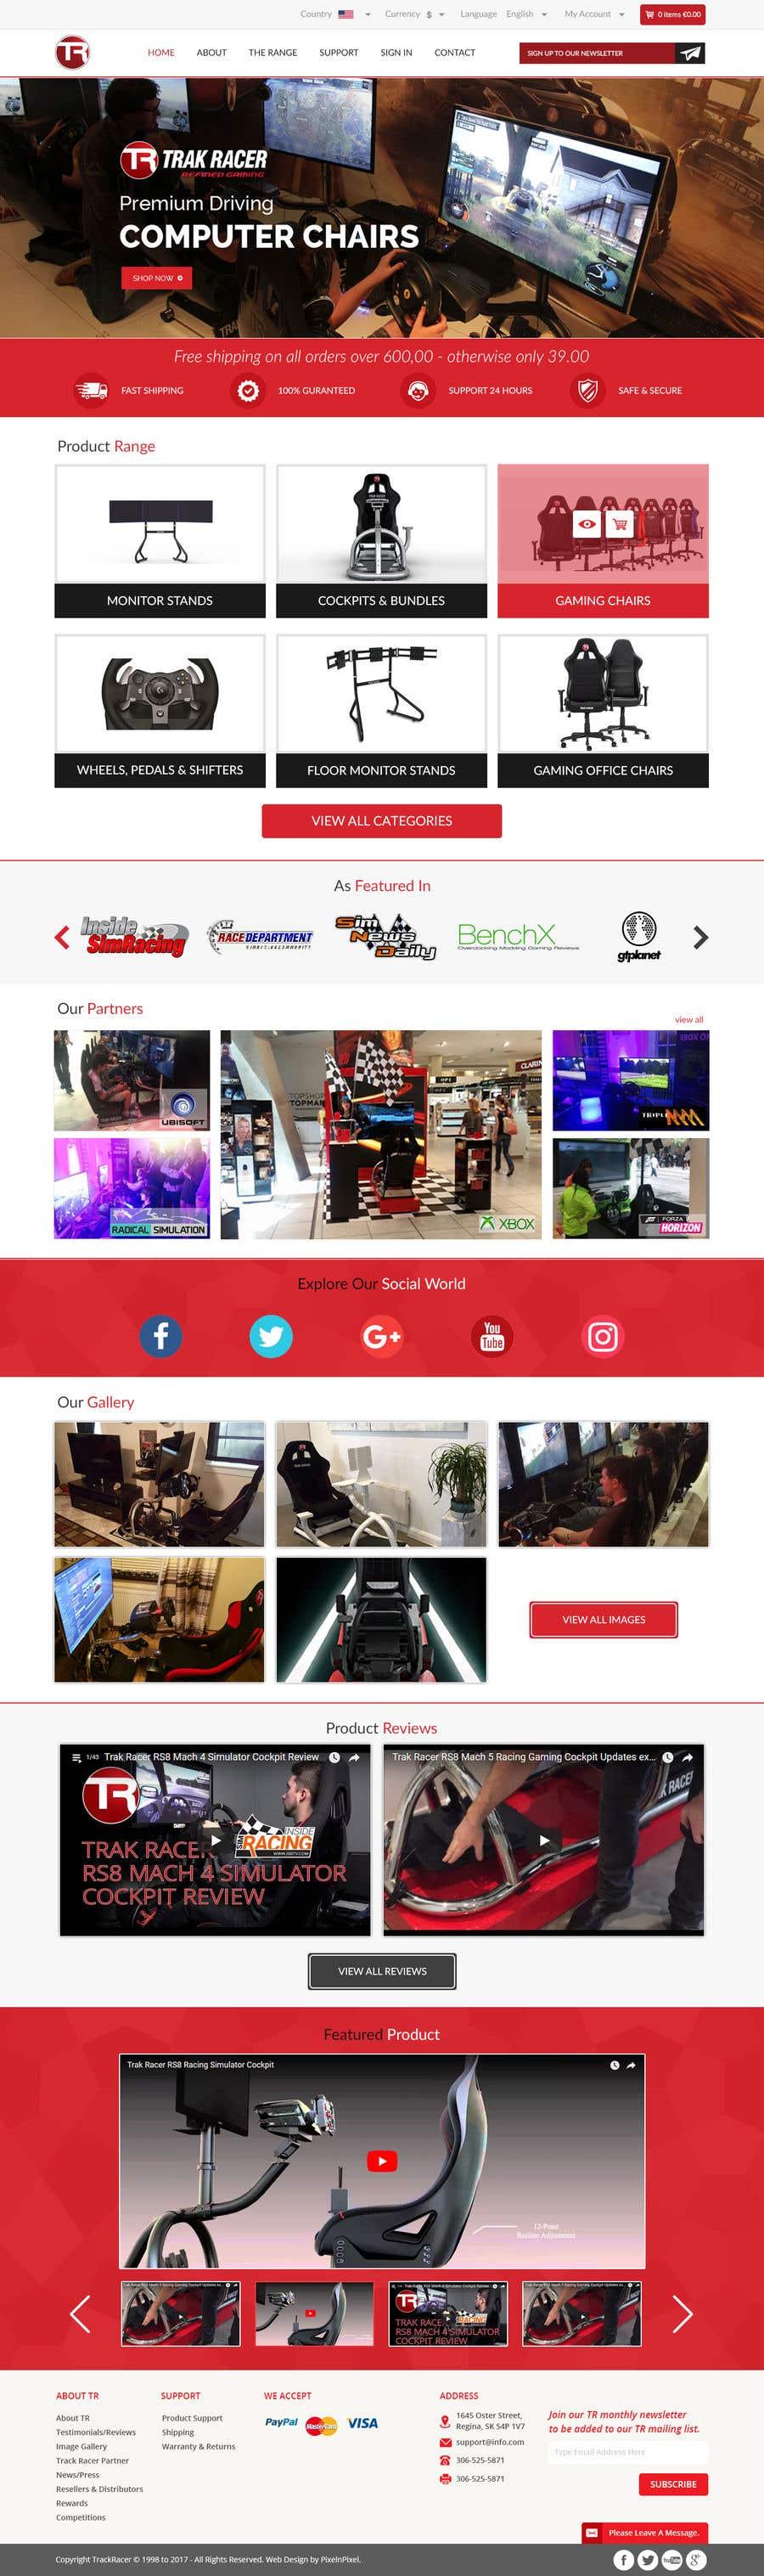 Penyertaan Peraduan #23 untuk Design a home page including header and footer